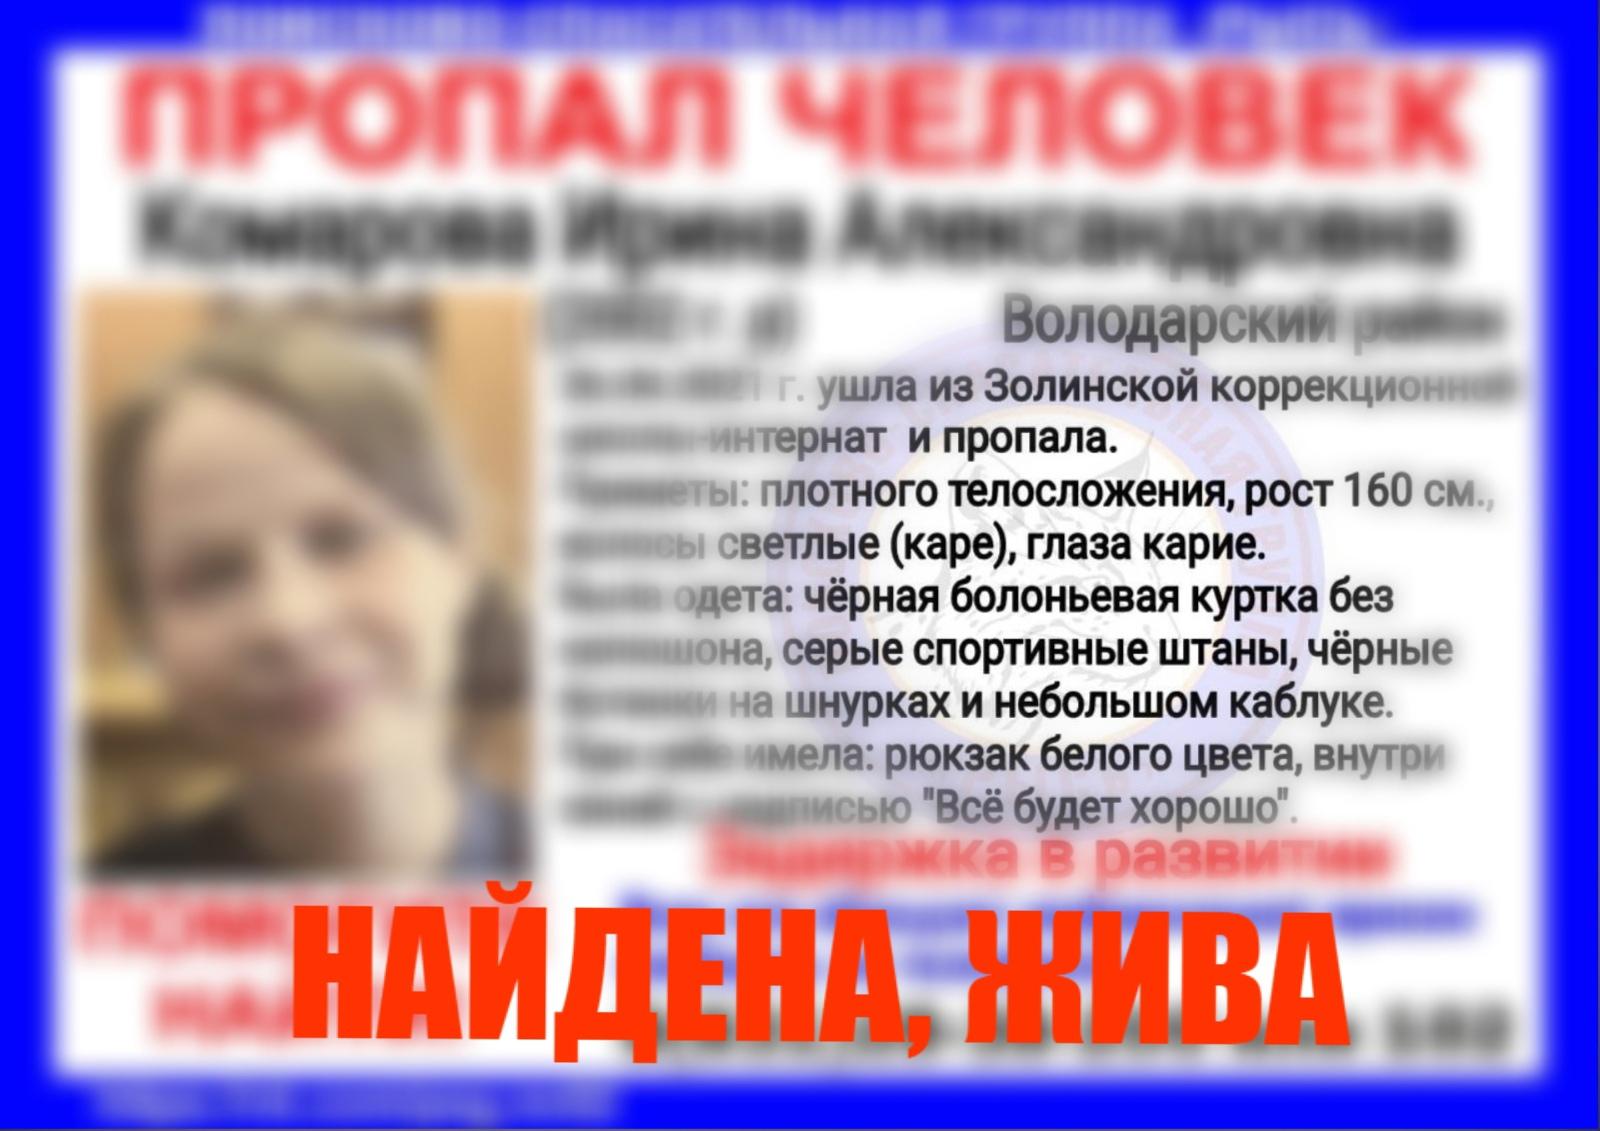 Комарова Ирина Александровна, 2002 г. р. Володарский р-н, с. Золино